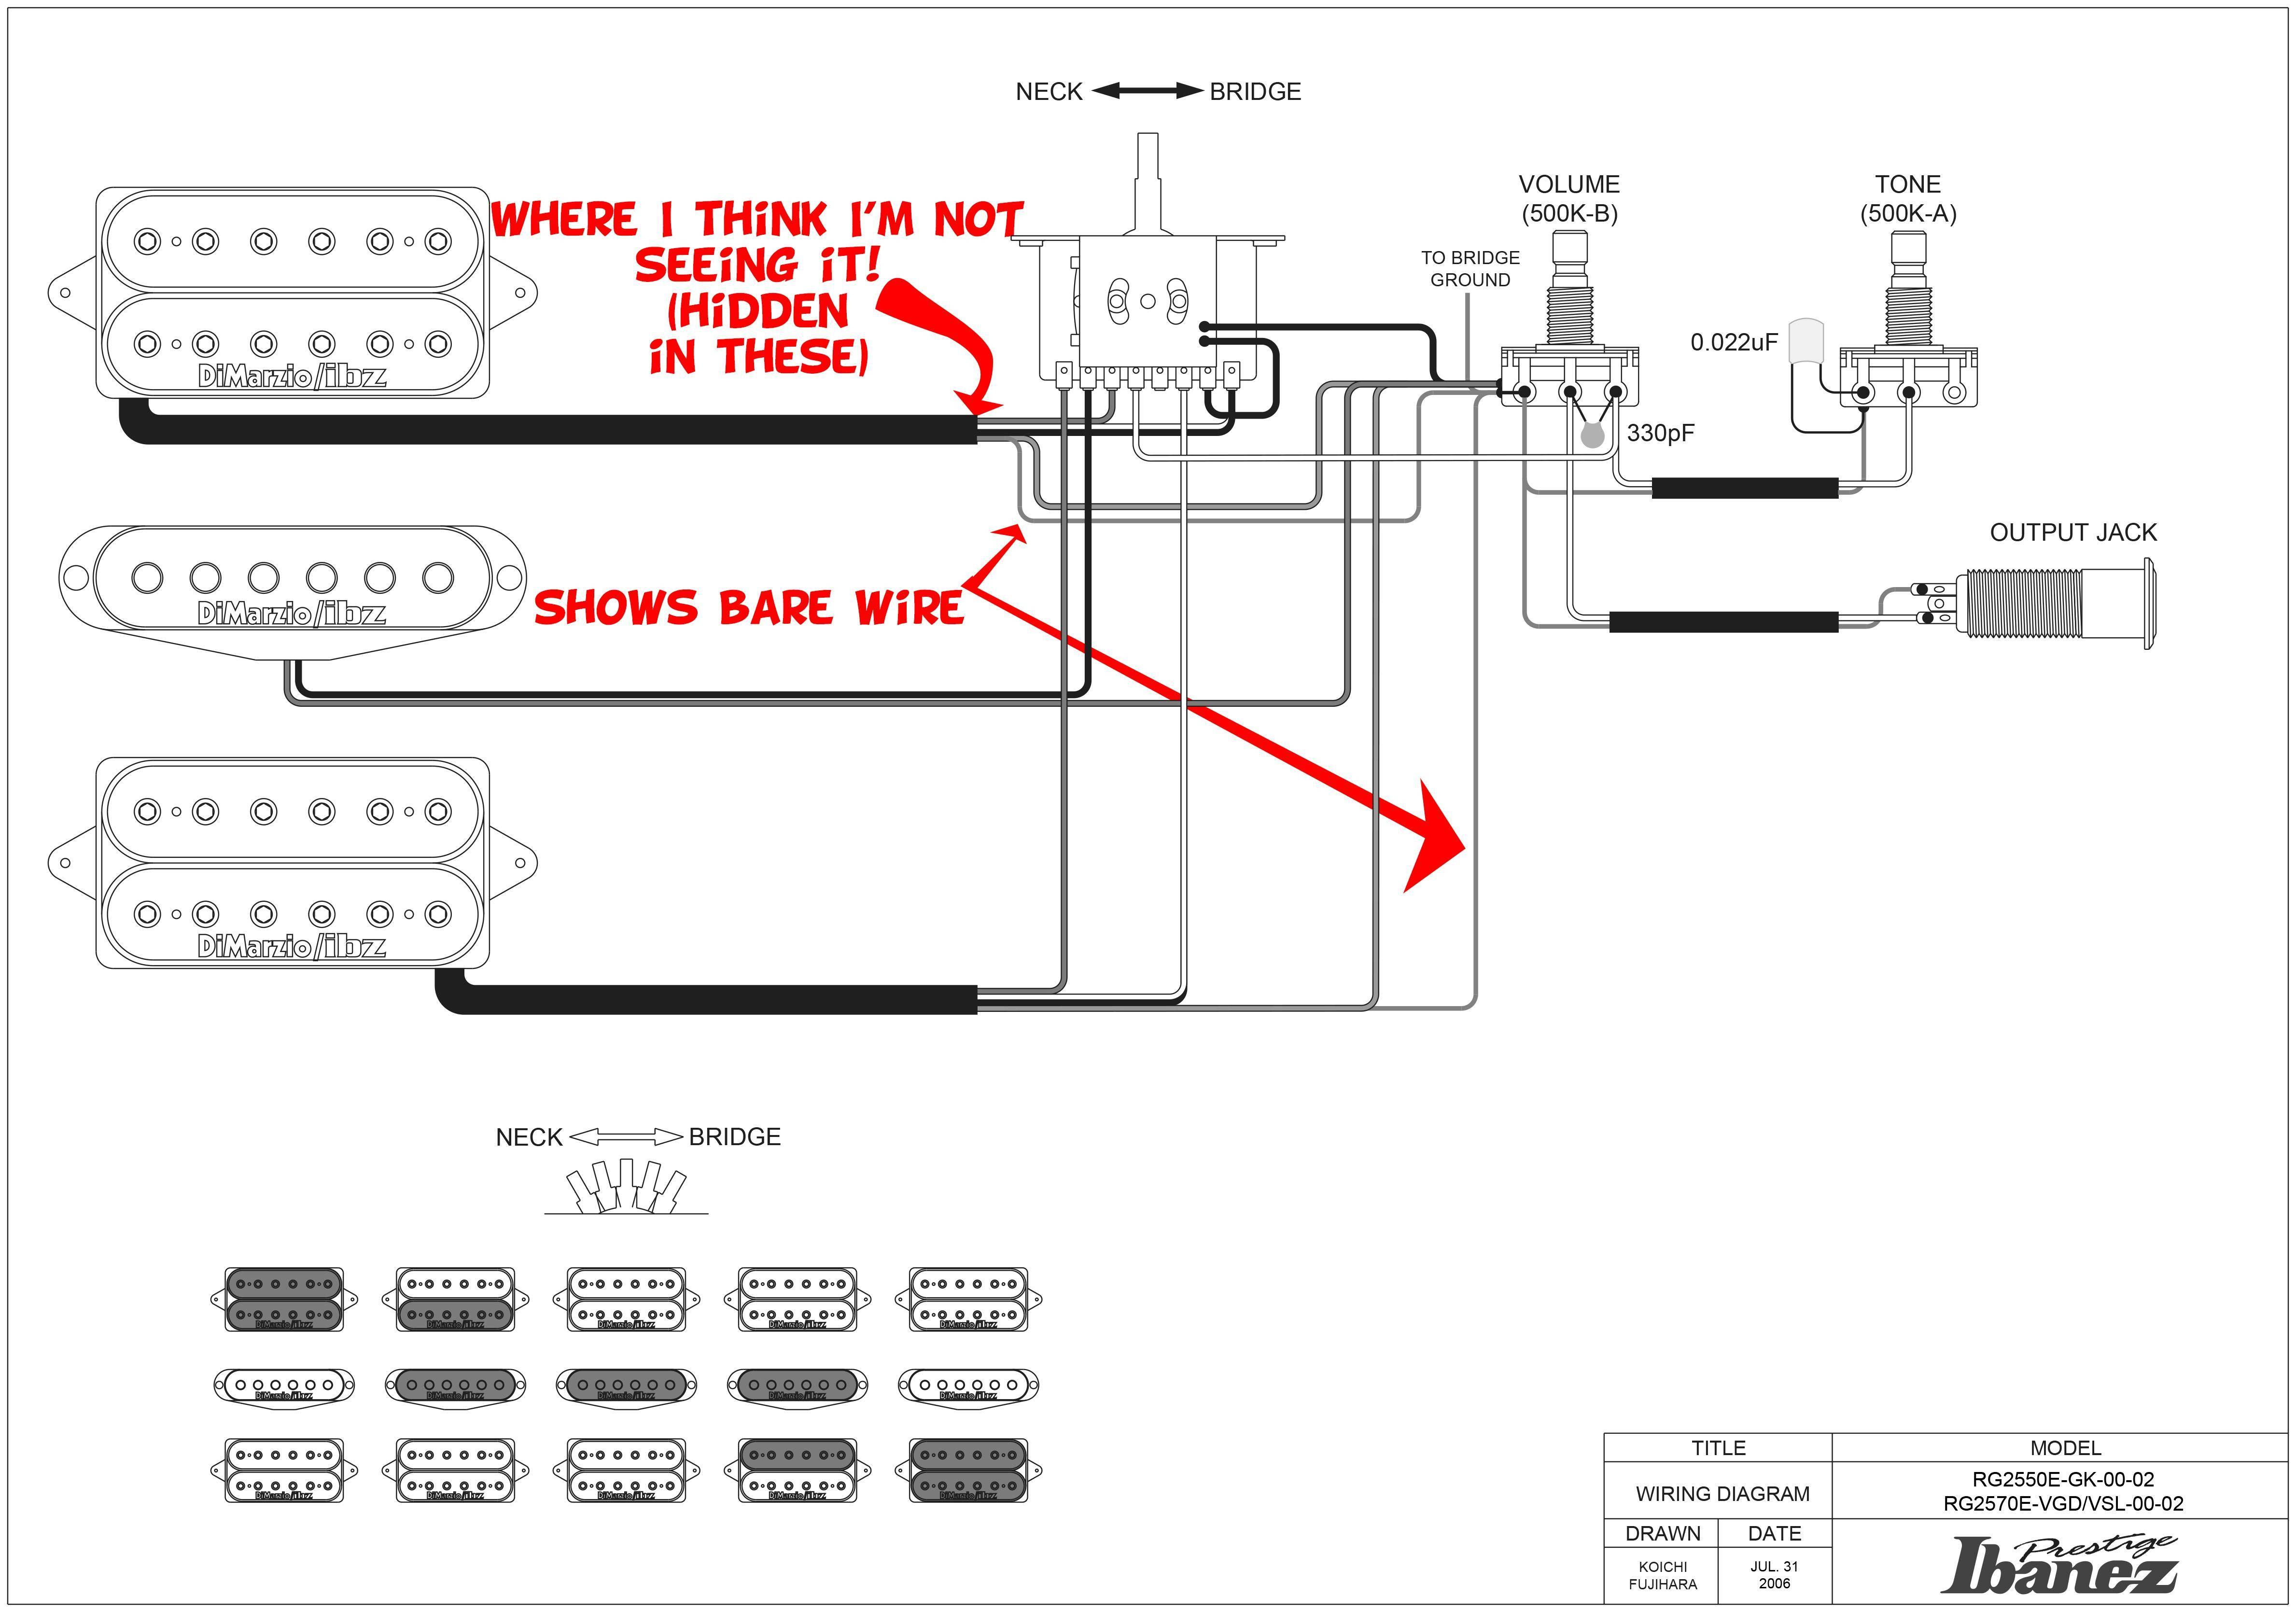 Harley Handlebar Wiring Diagram 1989. . Wiring Diagram on harley throttle by wire diagram, harley generator wiring, harley audio wiring harness, harley davidson wiring harness, harley-davidson electrical diagram, harley coil wiring, harley twist grip sensor wiring, harley handlebar clock, harley handlebar speaker, harley handlebar size chart, harley handlebar wiring color and function, harley headlight wiring, harley 32310-08, harley speedometer wiring, harley davidson wiring diagrams online, harley charging system diagram, harley davidson touring handlebars, harley wiring schematics, harley davidson controls diagram,